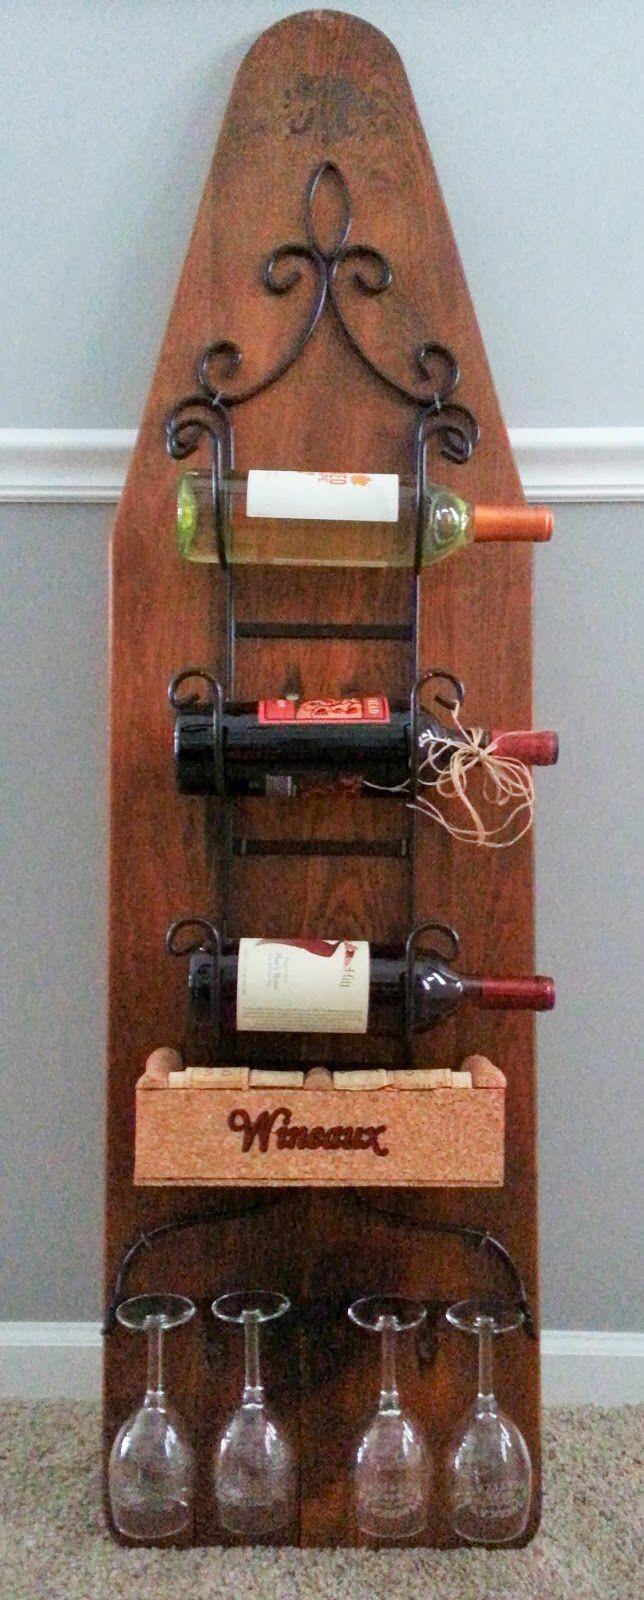 Image from http://1.bp.blogspot.com/-jv60HO3ztXA/UuWXzuOcPuI/AAAAAAAABAc/wFnGNlkgvA8/s1600/wine+rack.jpg.